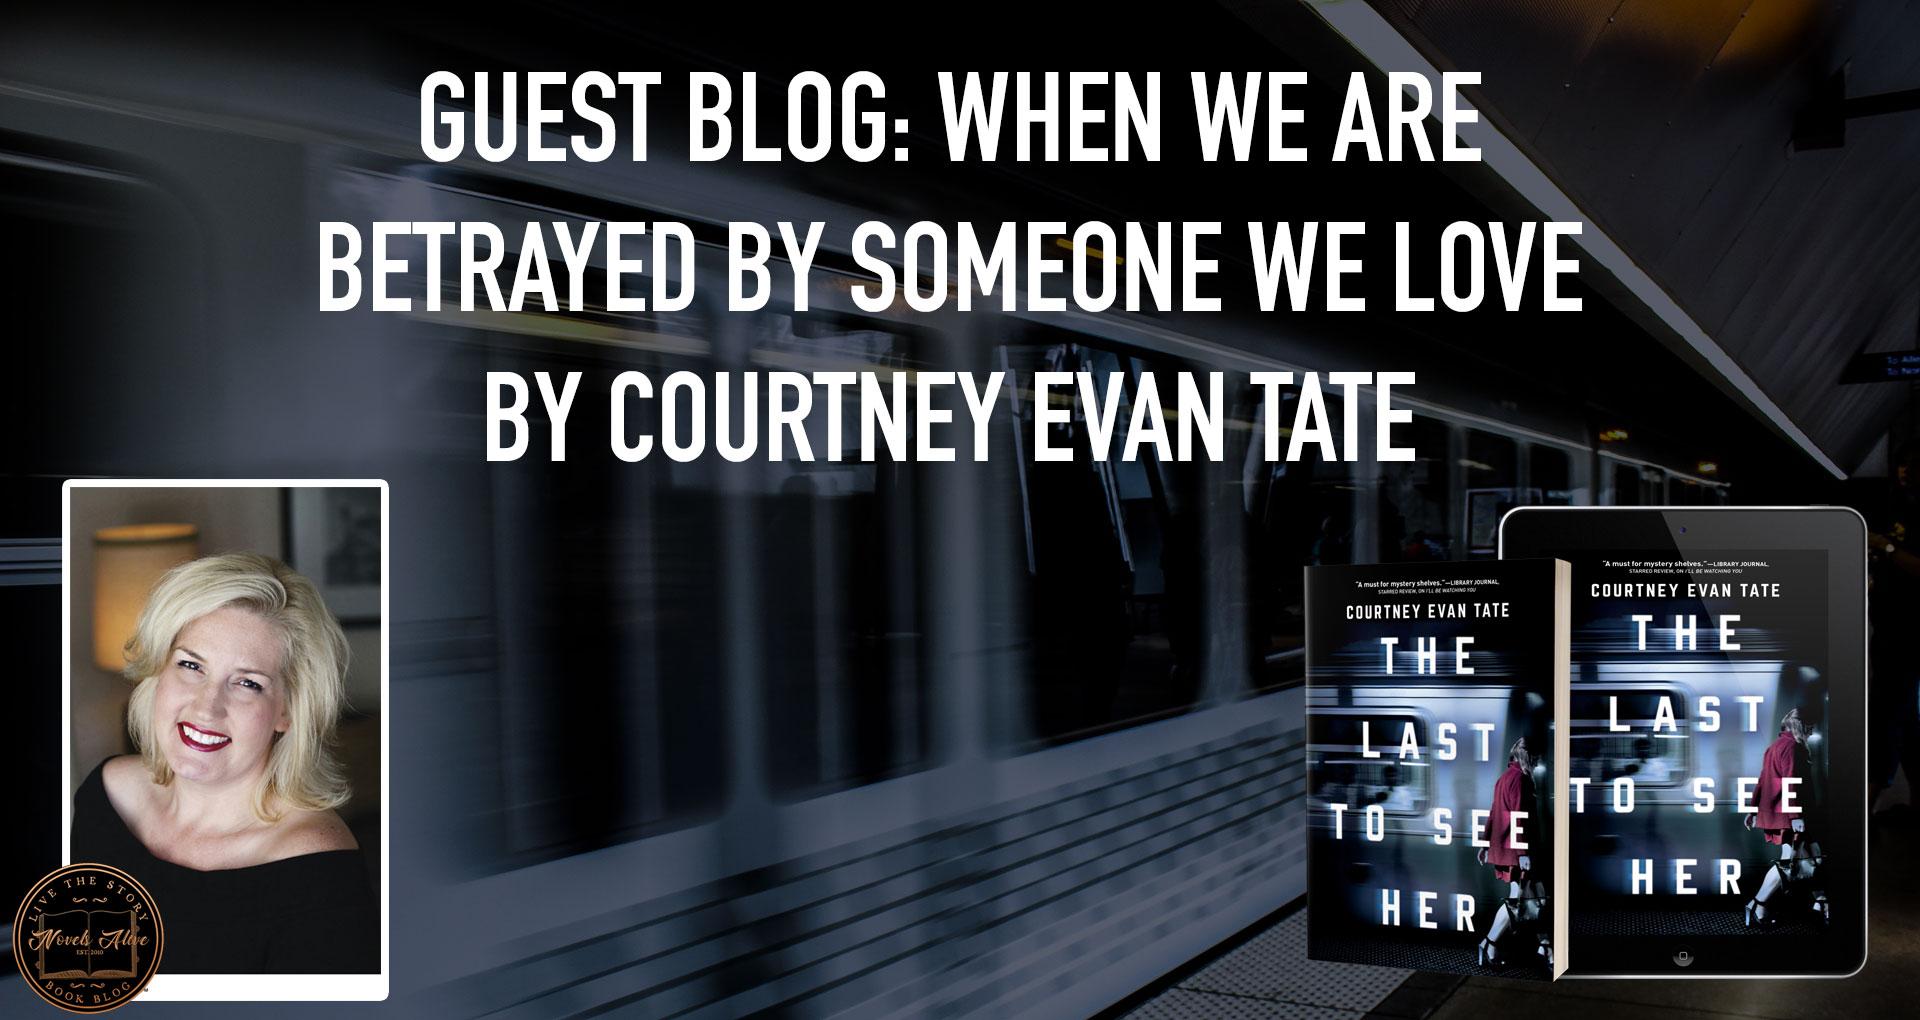 Courtney-Evan-Tate-Guest-Blog